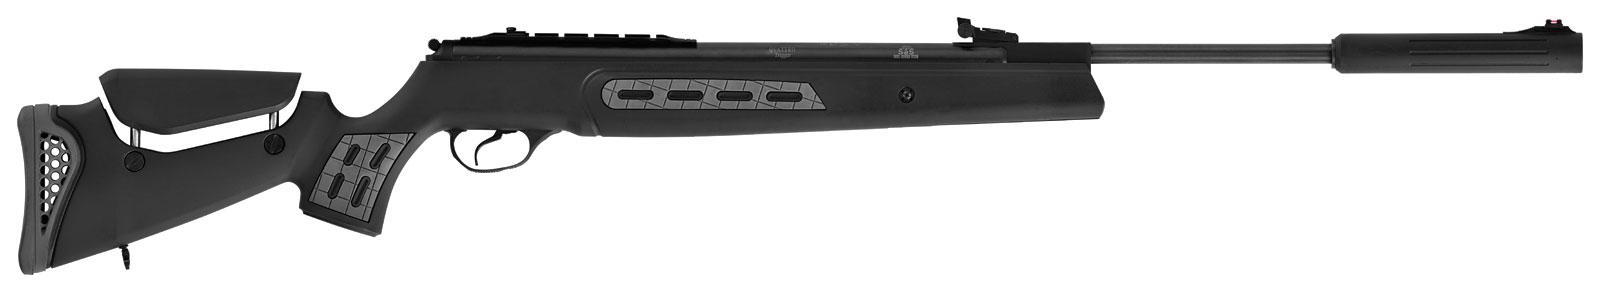 MOD 125 Sniper